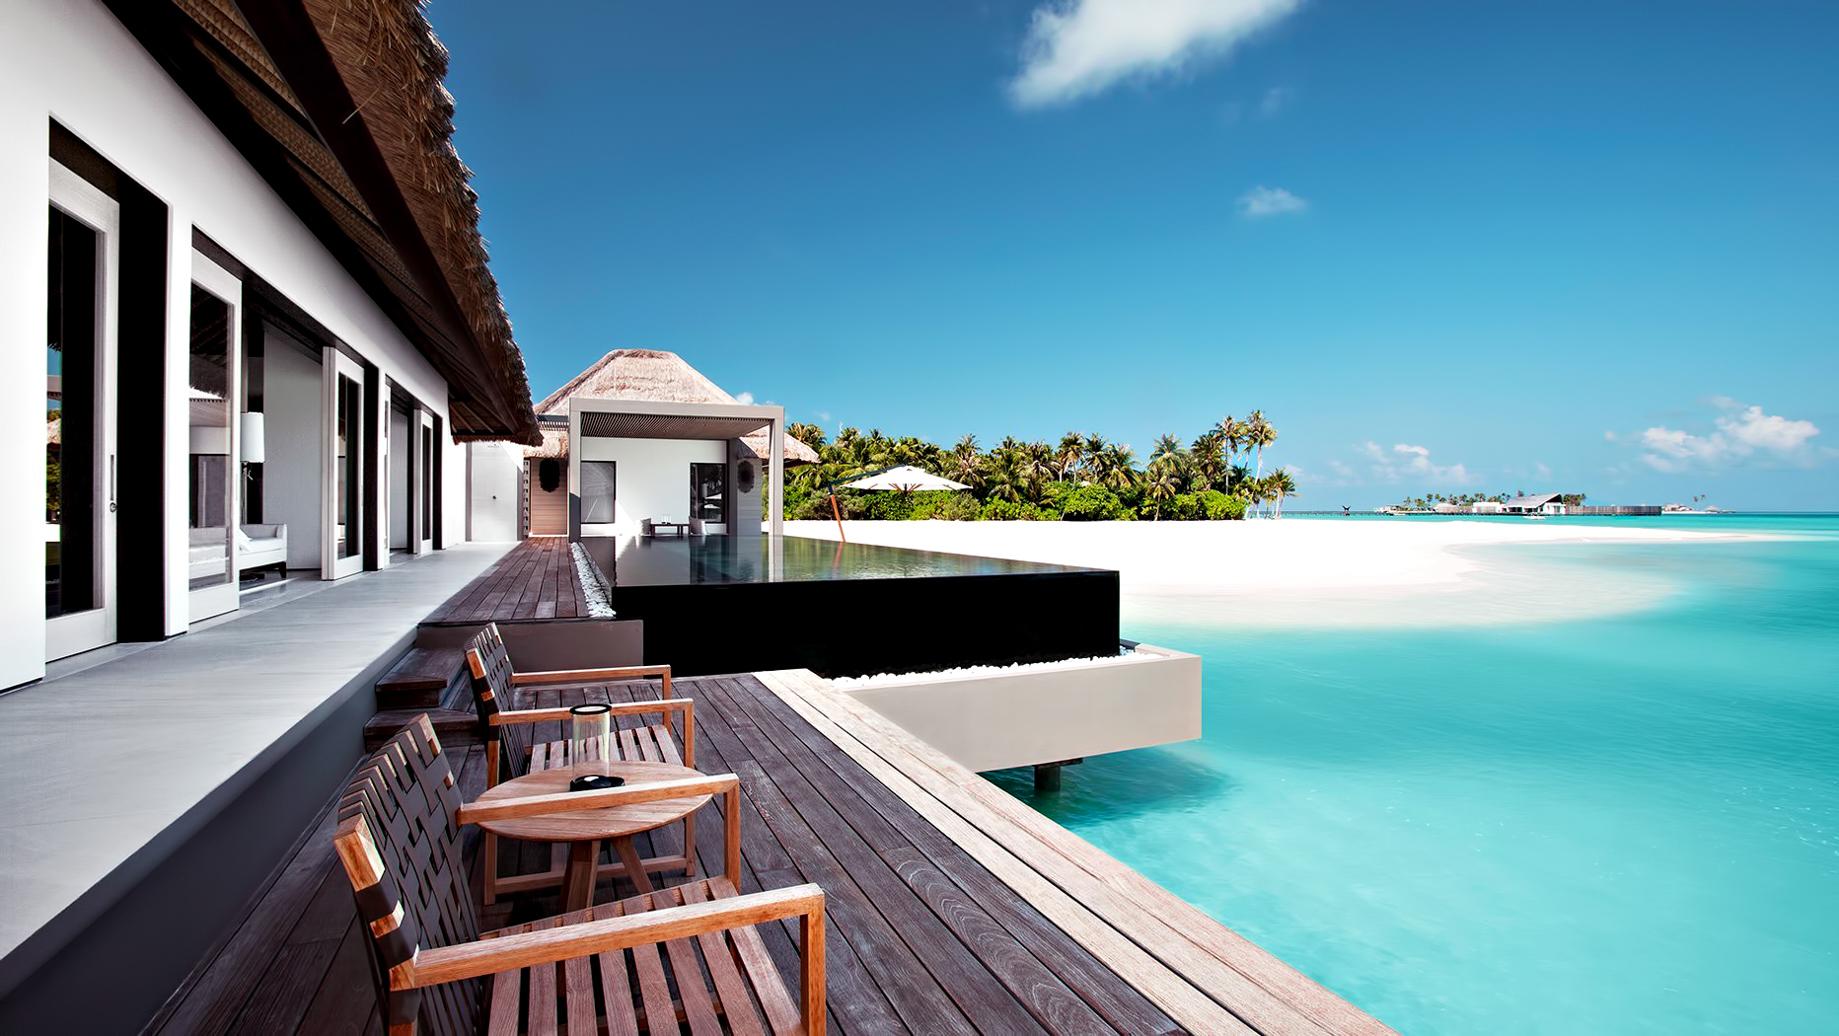 Cheval Blanc Randheli Luxury Resort – Noonu Atoll, Maldives – Overwater Villa Infinity Pool Deck